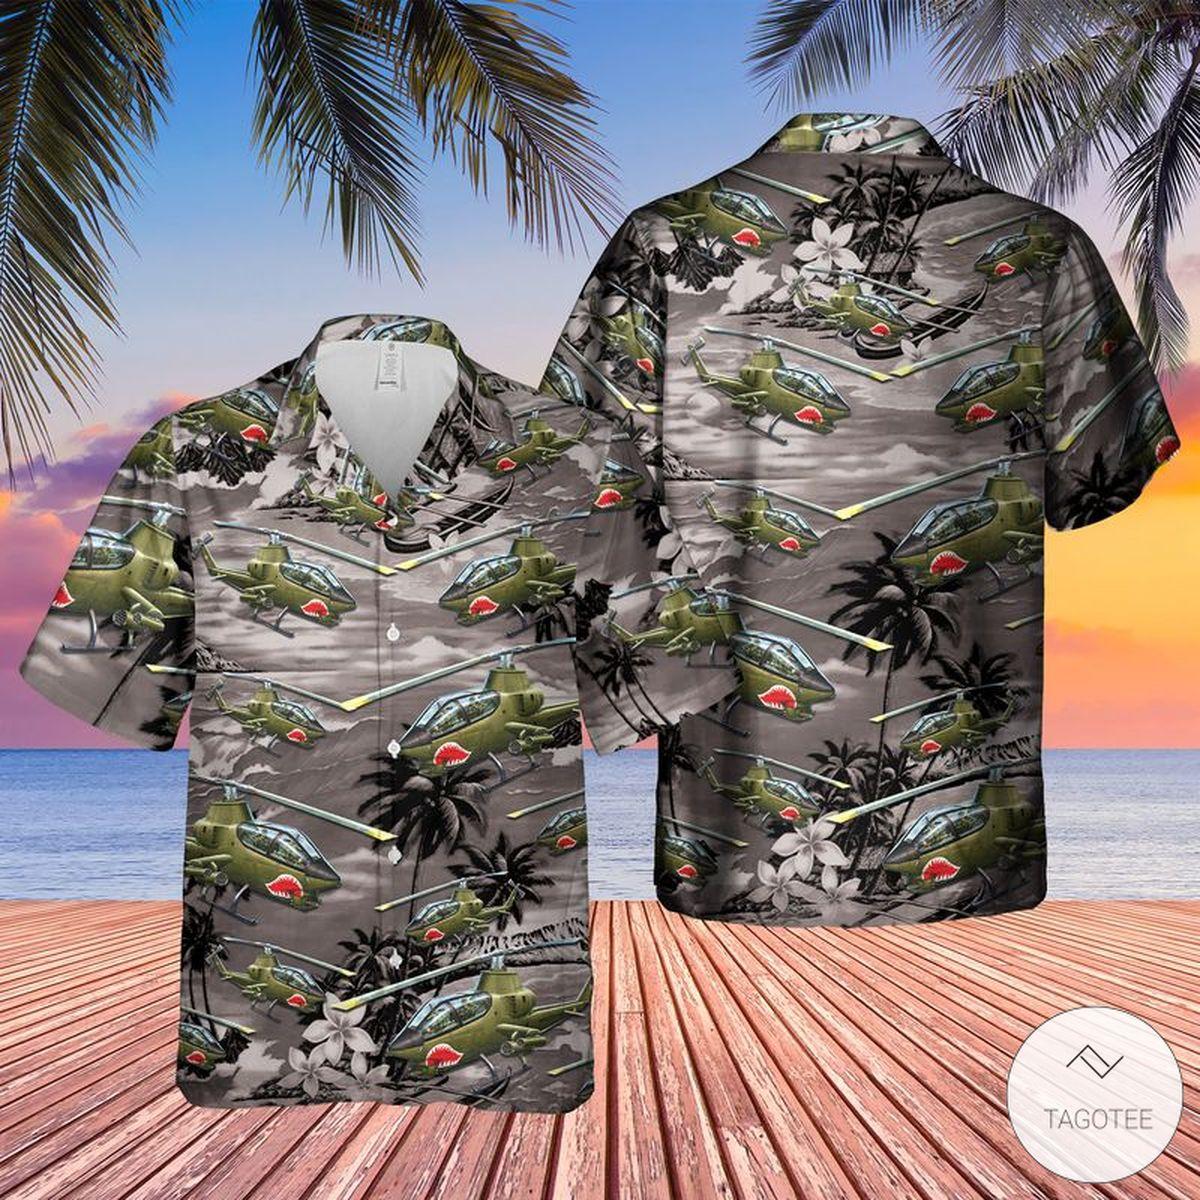 Vietnam Era AH-1 Cobra Helicopter Hawaiian Shirt, Beach Shorts